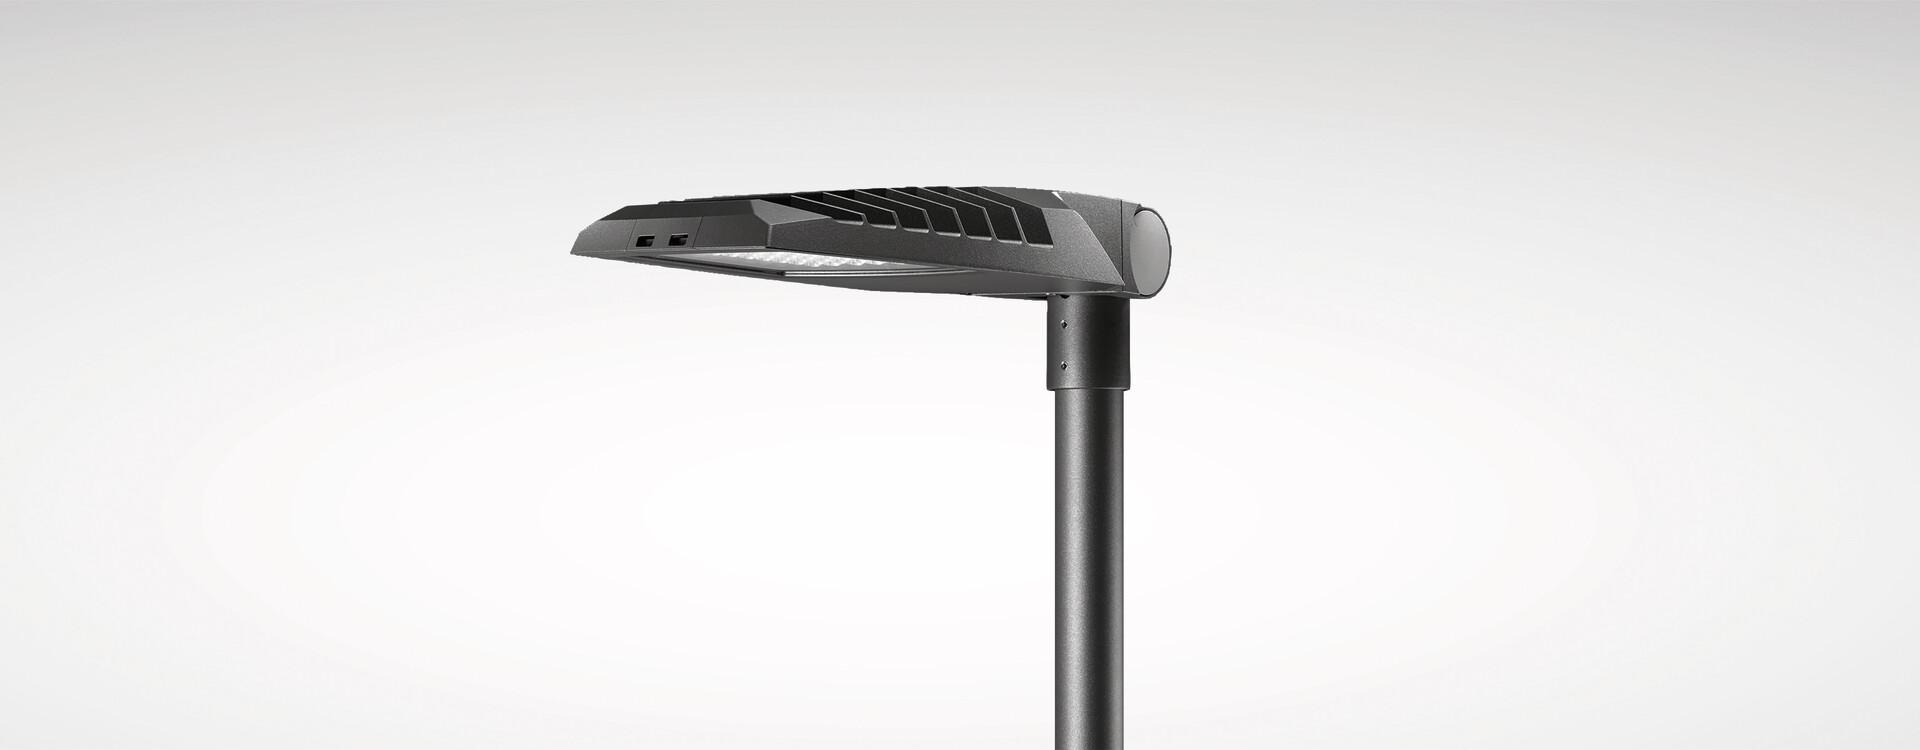 Lumega iq 90 post top luminaires outdoor lighting for Luminaire outdoor